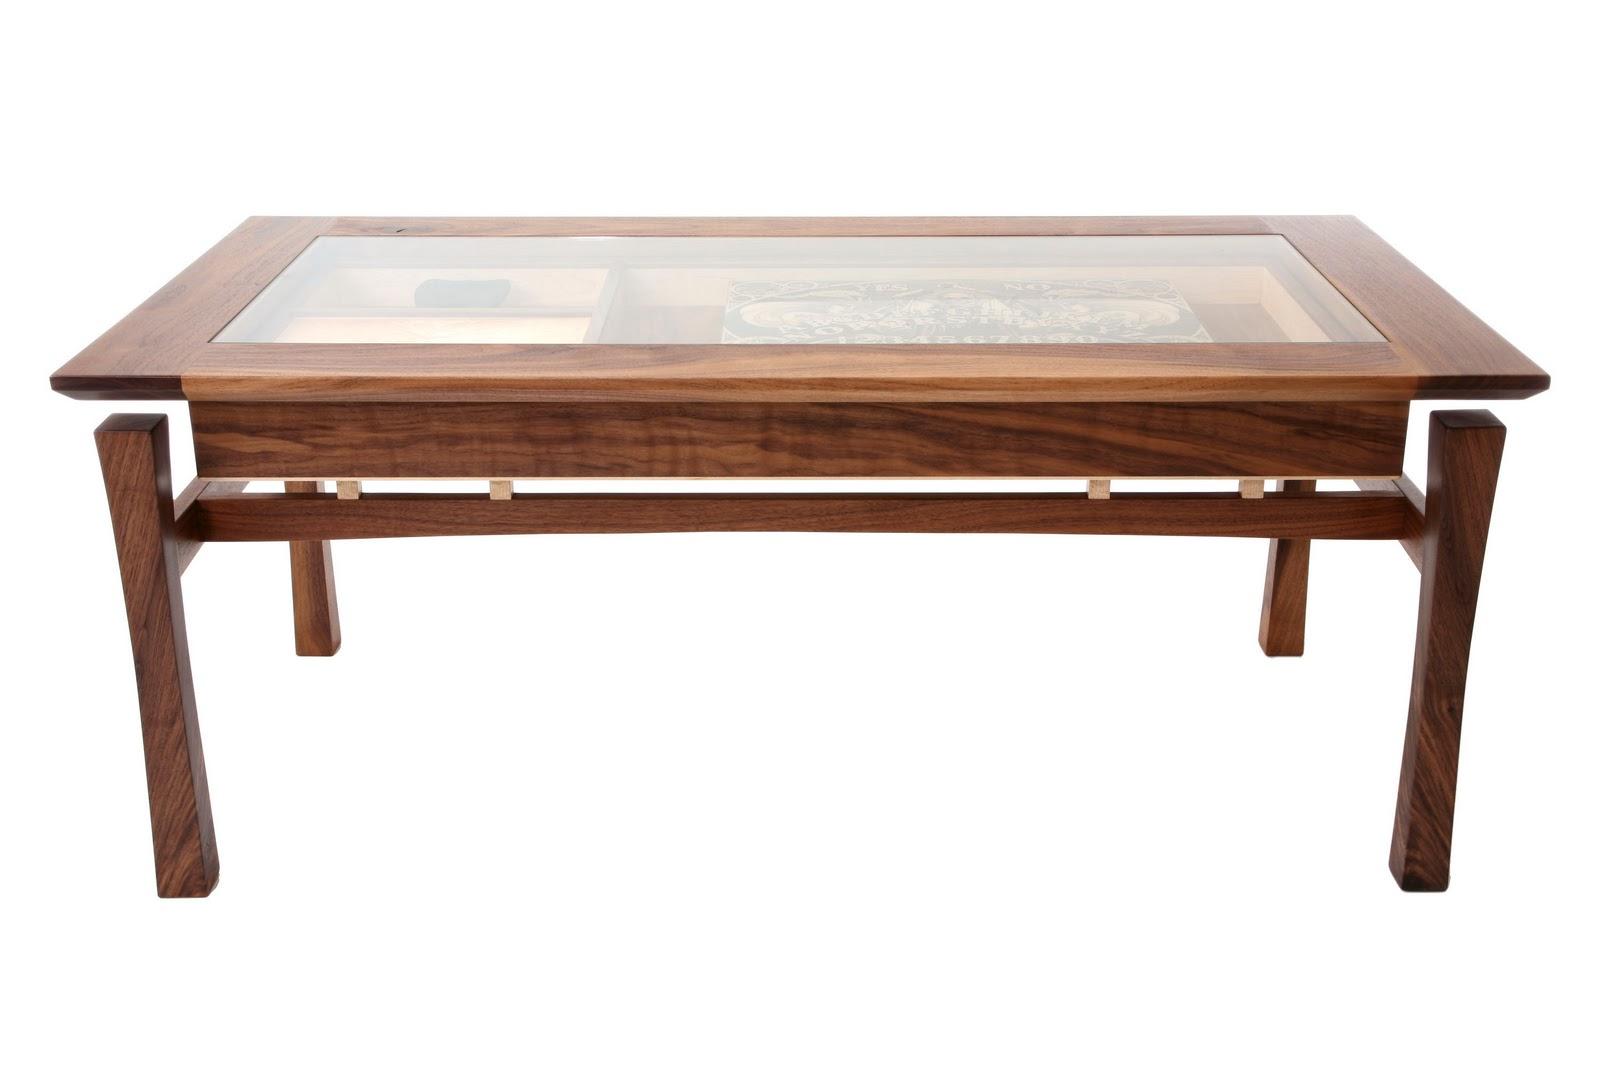 alex builds things: Floating Ouija Coffee Table